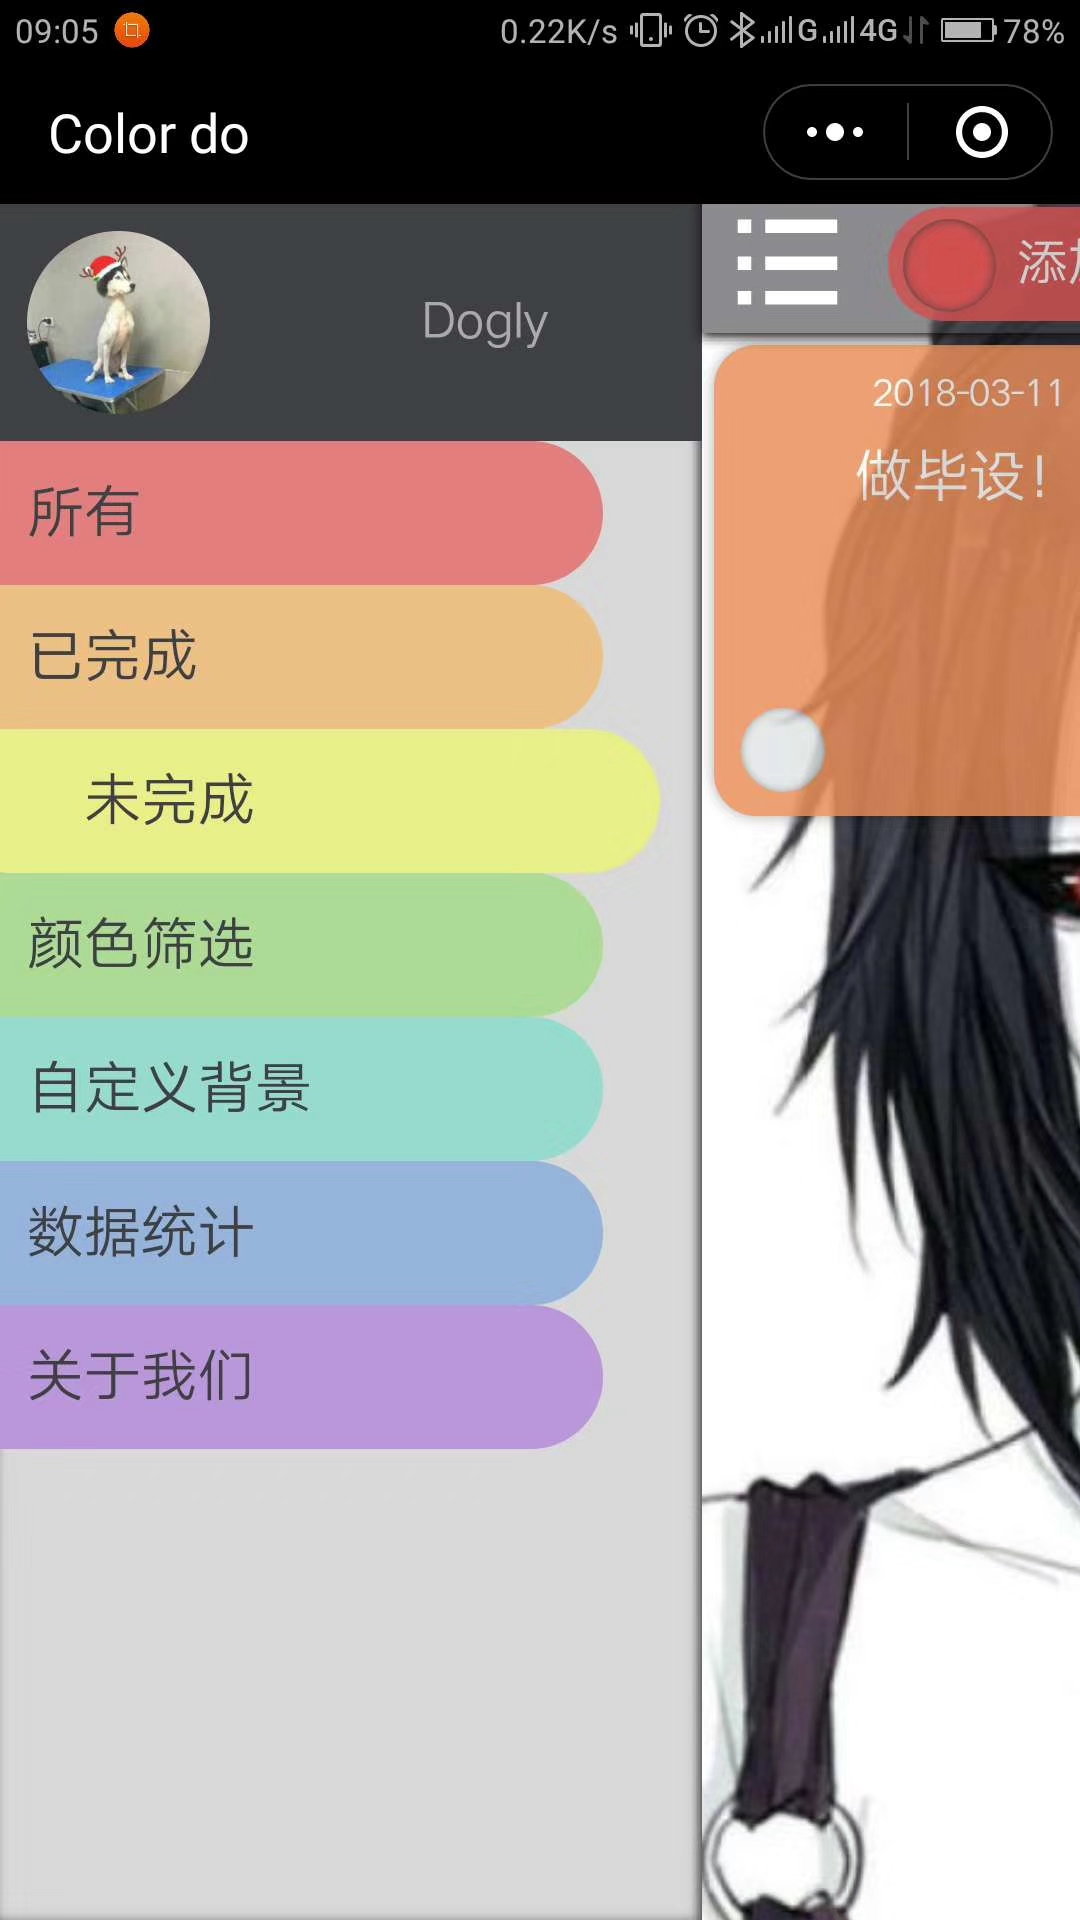 Colordo小程序截图